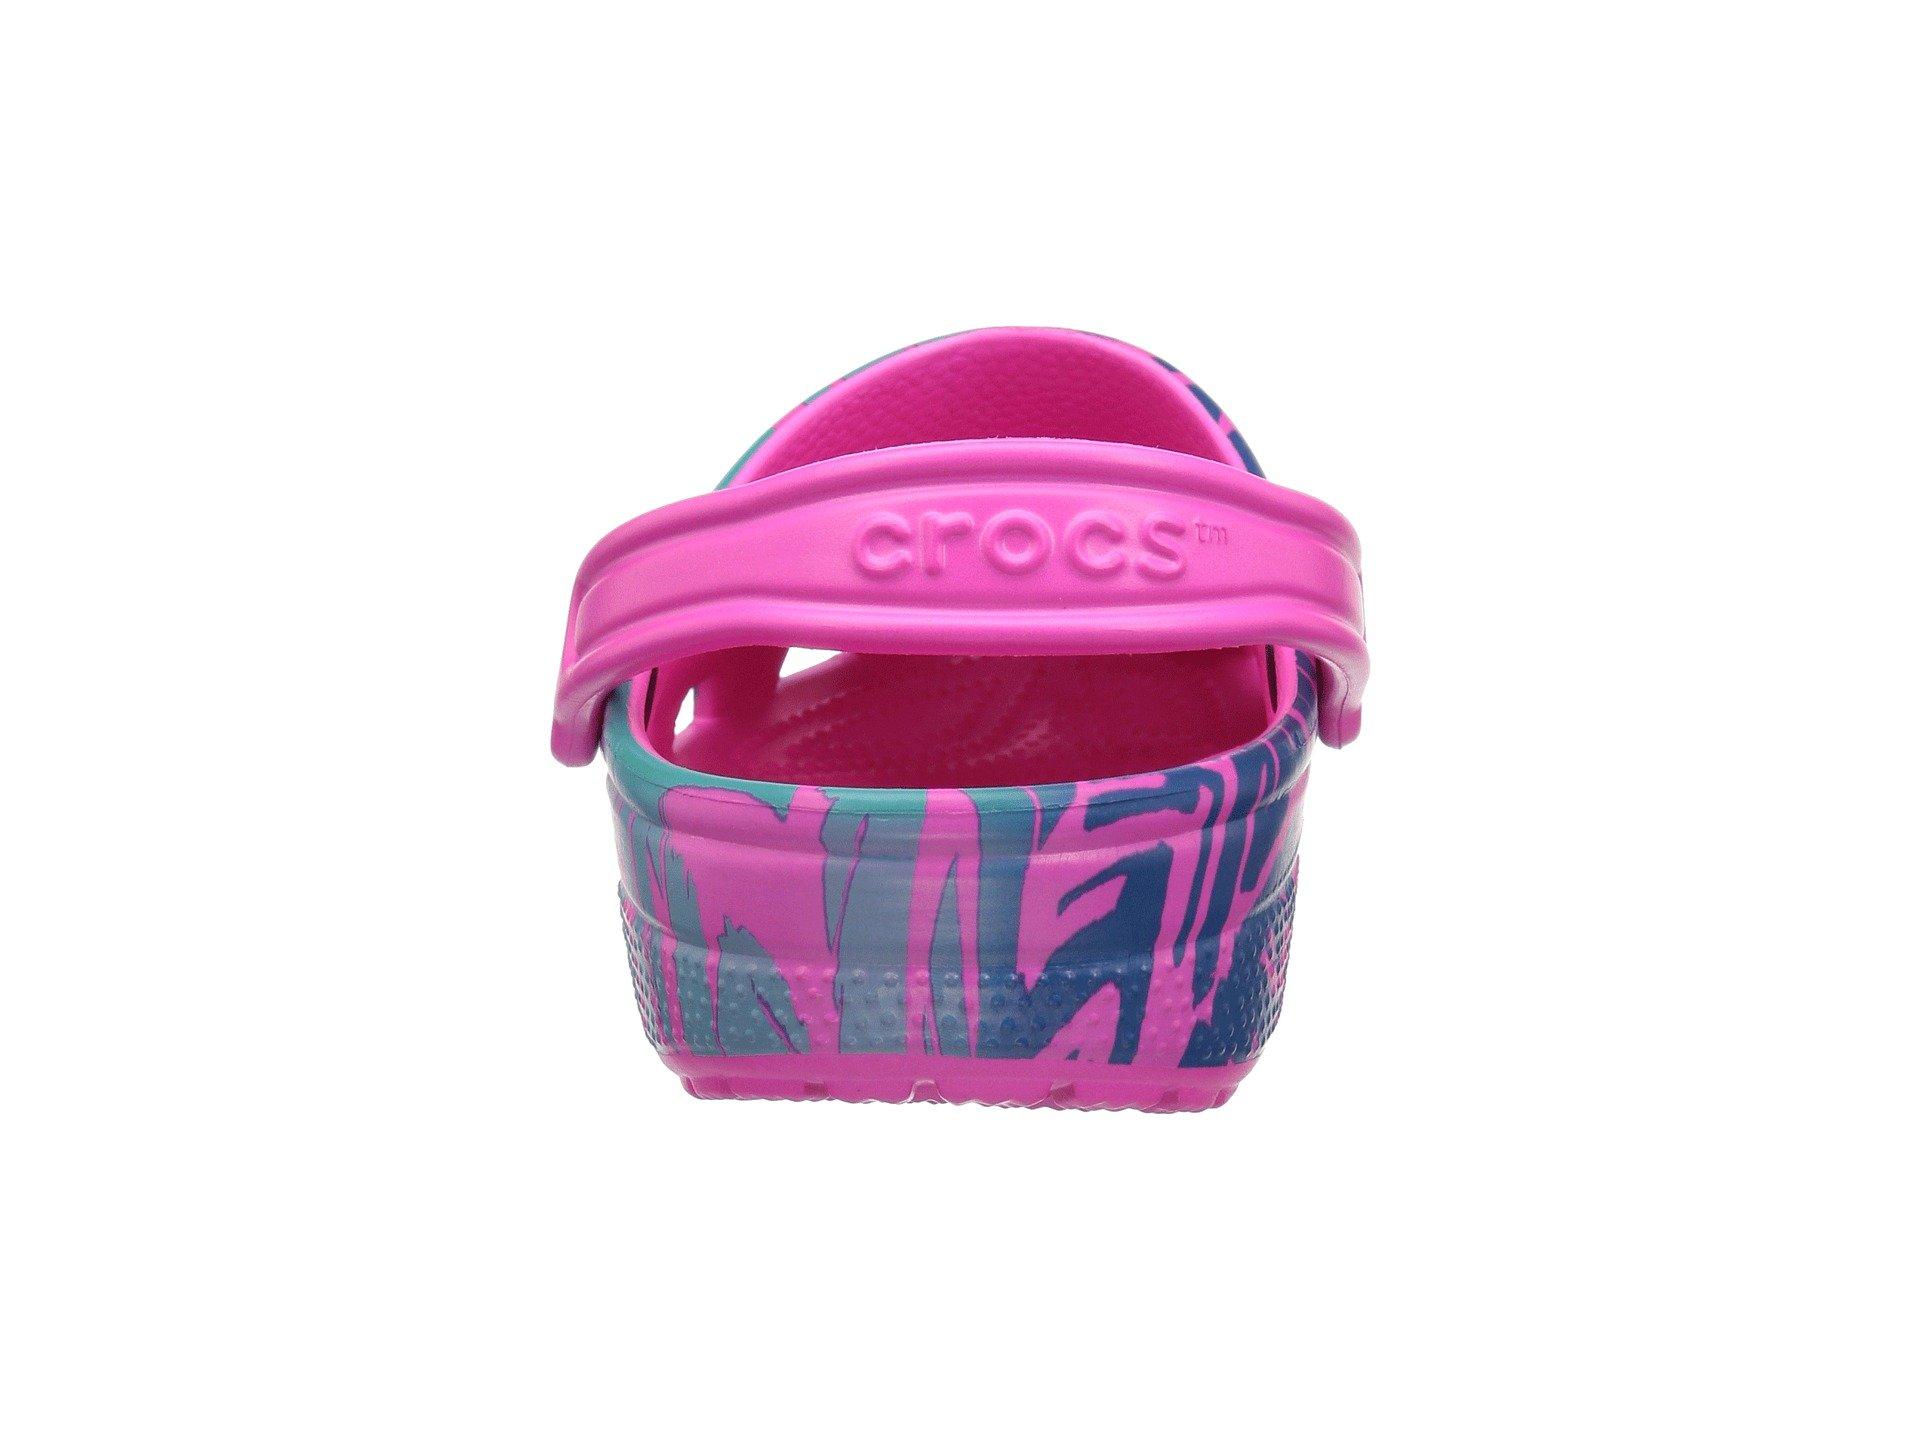 Clog Turquoise Classic Graphic neon Pink Ii Crocs xIgaw0x